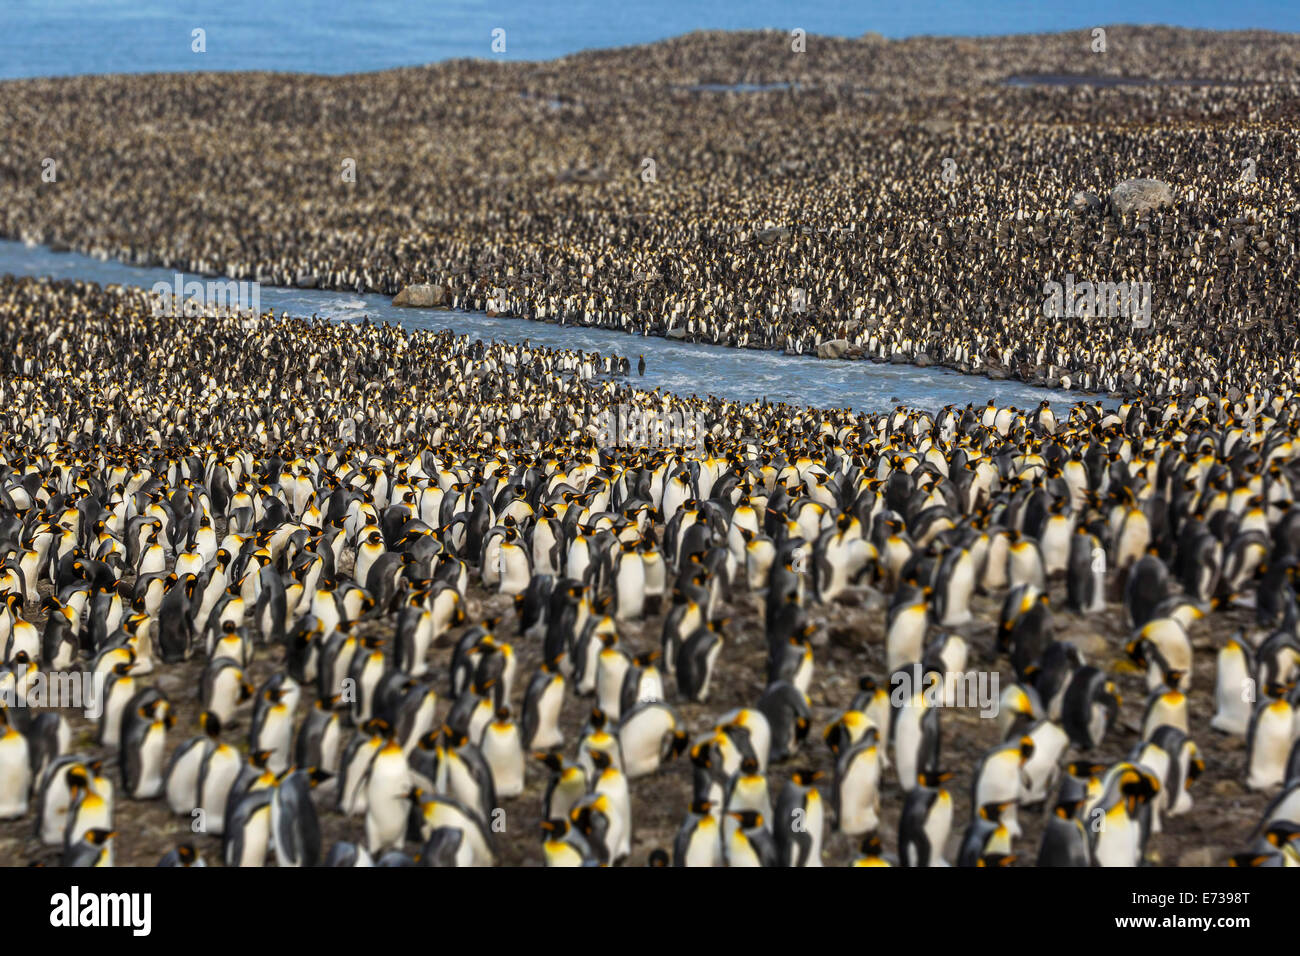 King penguin (Aptenodytes patagonicus) breeding colony at St. Andrews Bay, South Georgia, UK Overseas Protectorate - Stock Image